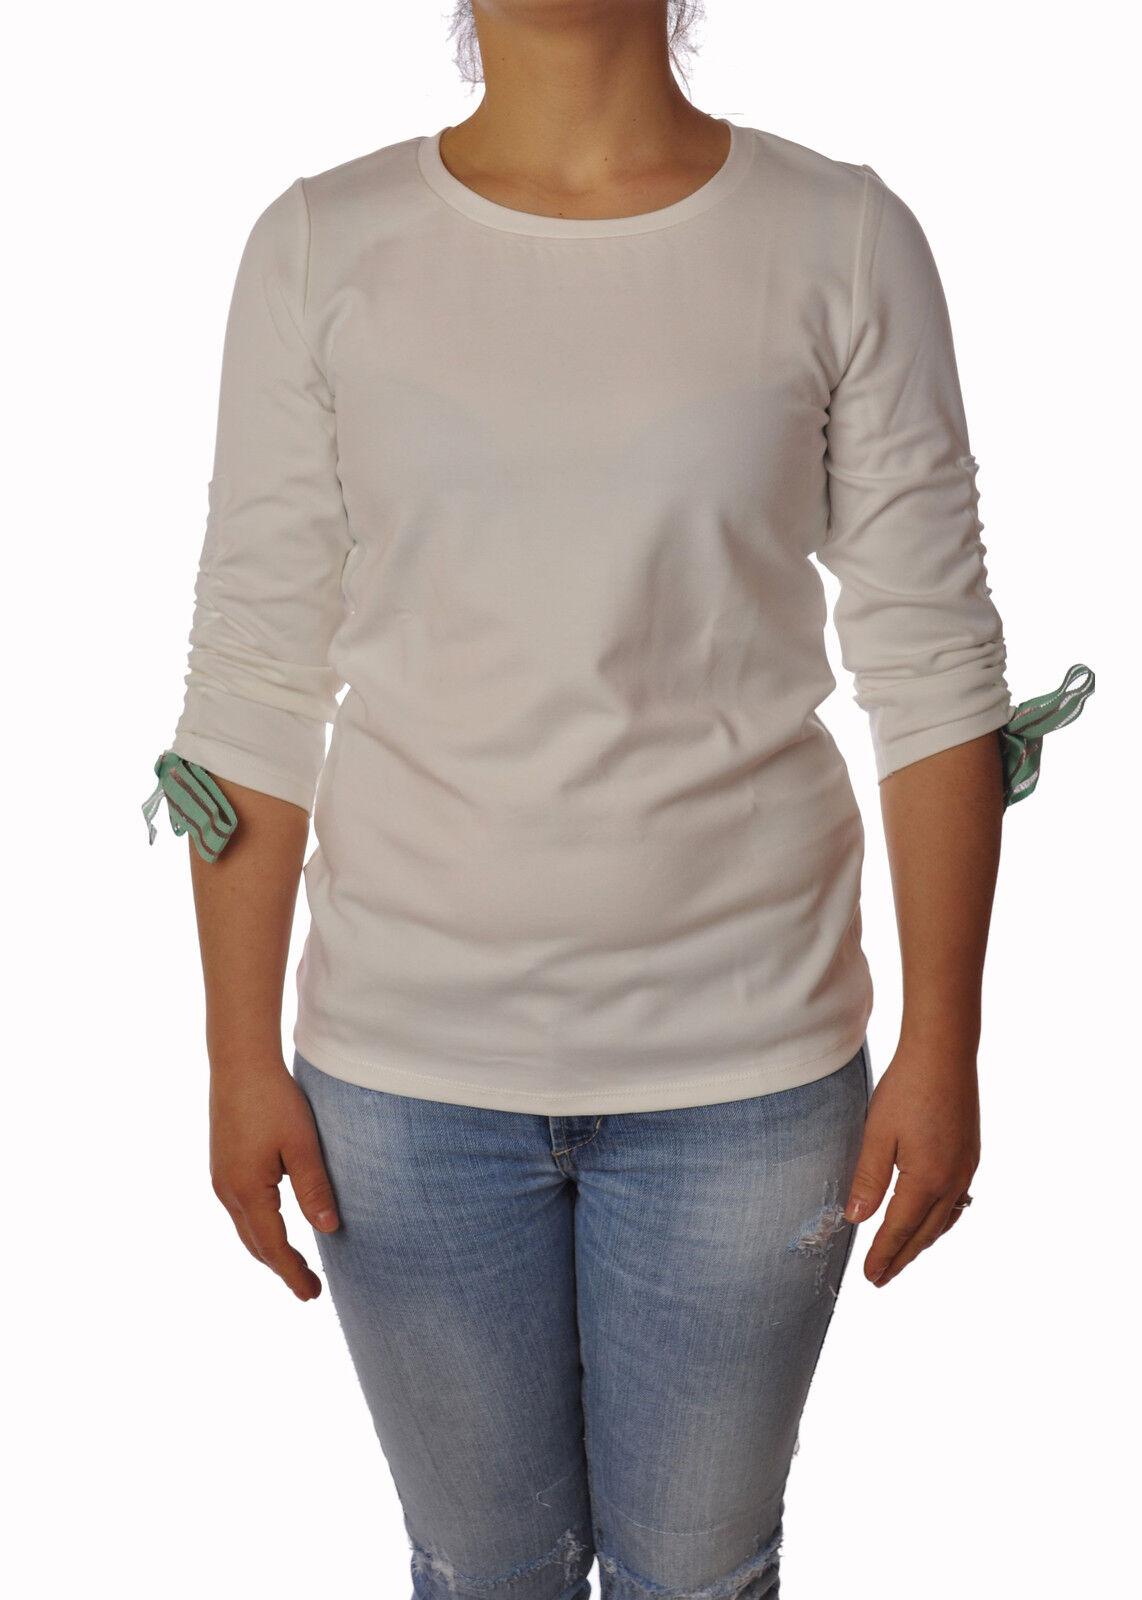 Hoss  -  Sweaters - Female - White - 3666725A183930